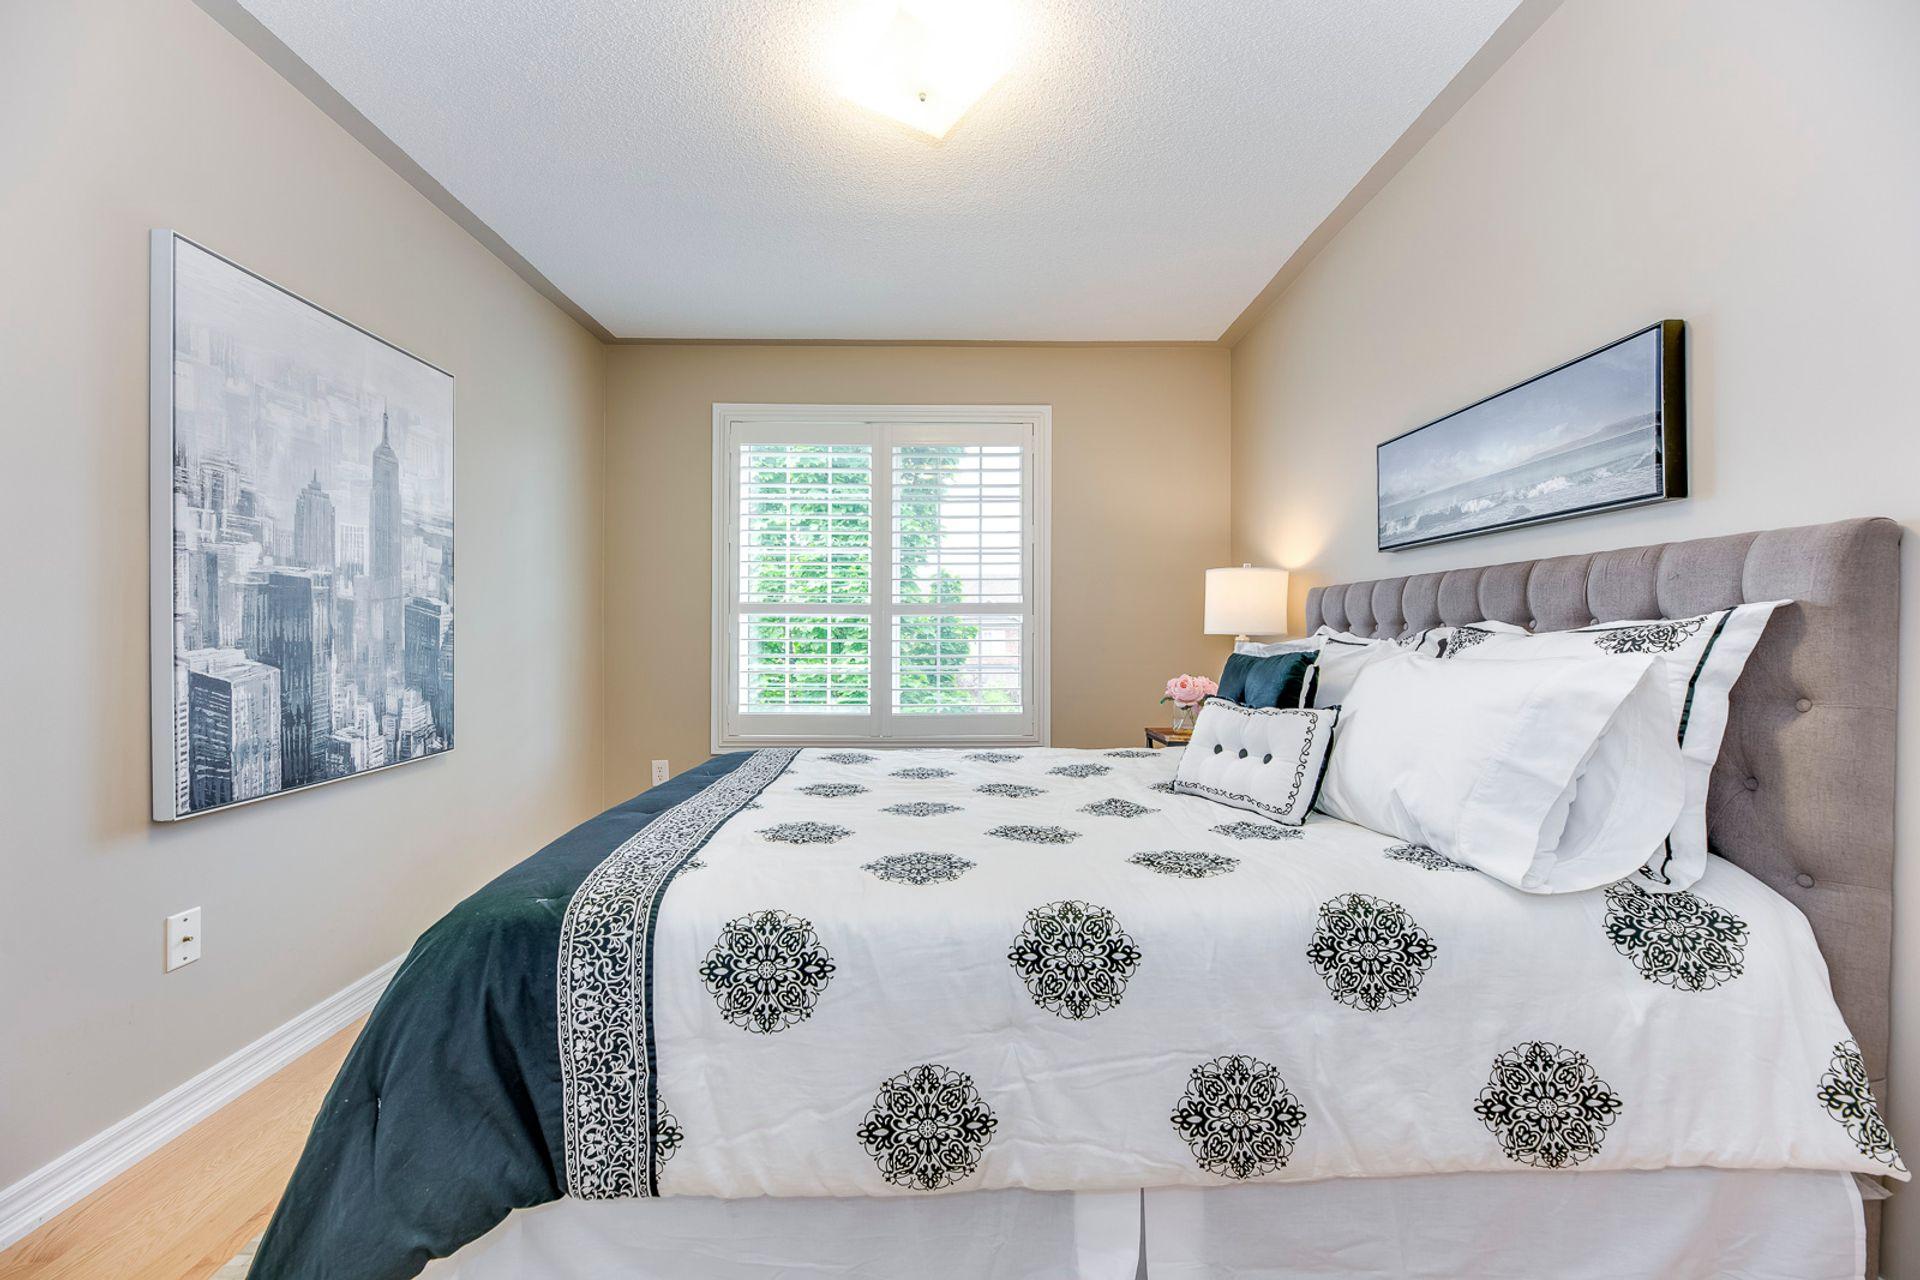 2nd Bedroom - 3720 Nightstar Dr, Mississauga - Elite3 & Team at 3720 Nightstar Drive, Churchill Meadows, Mississauga